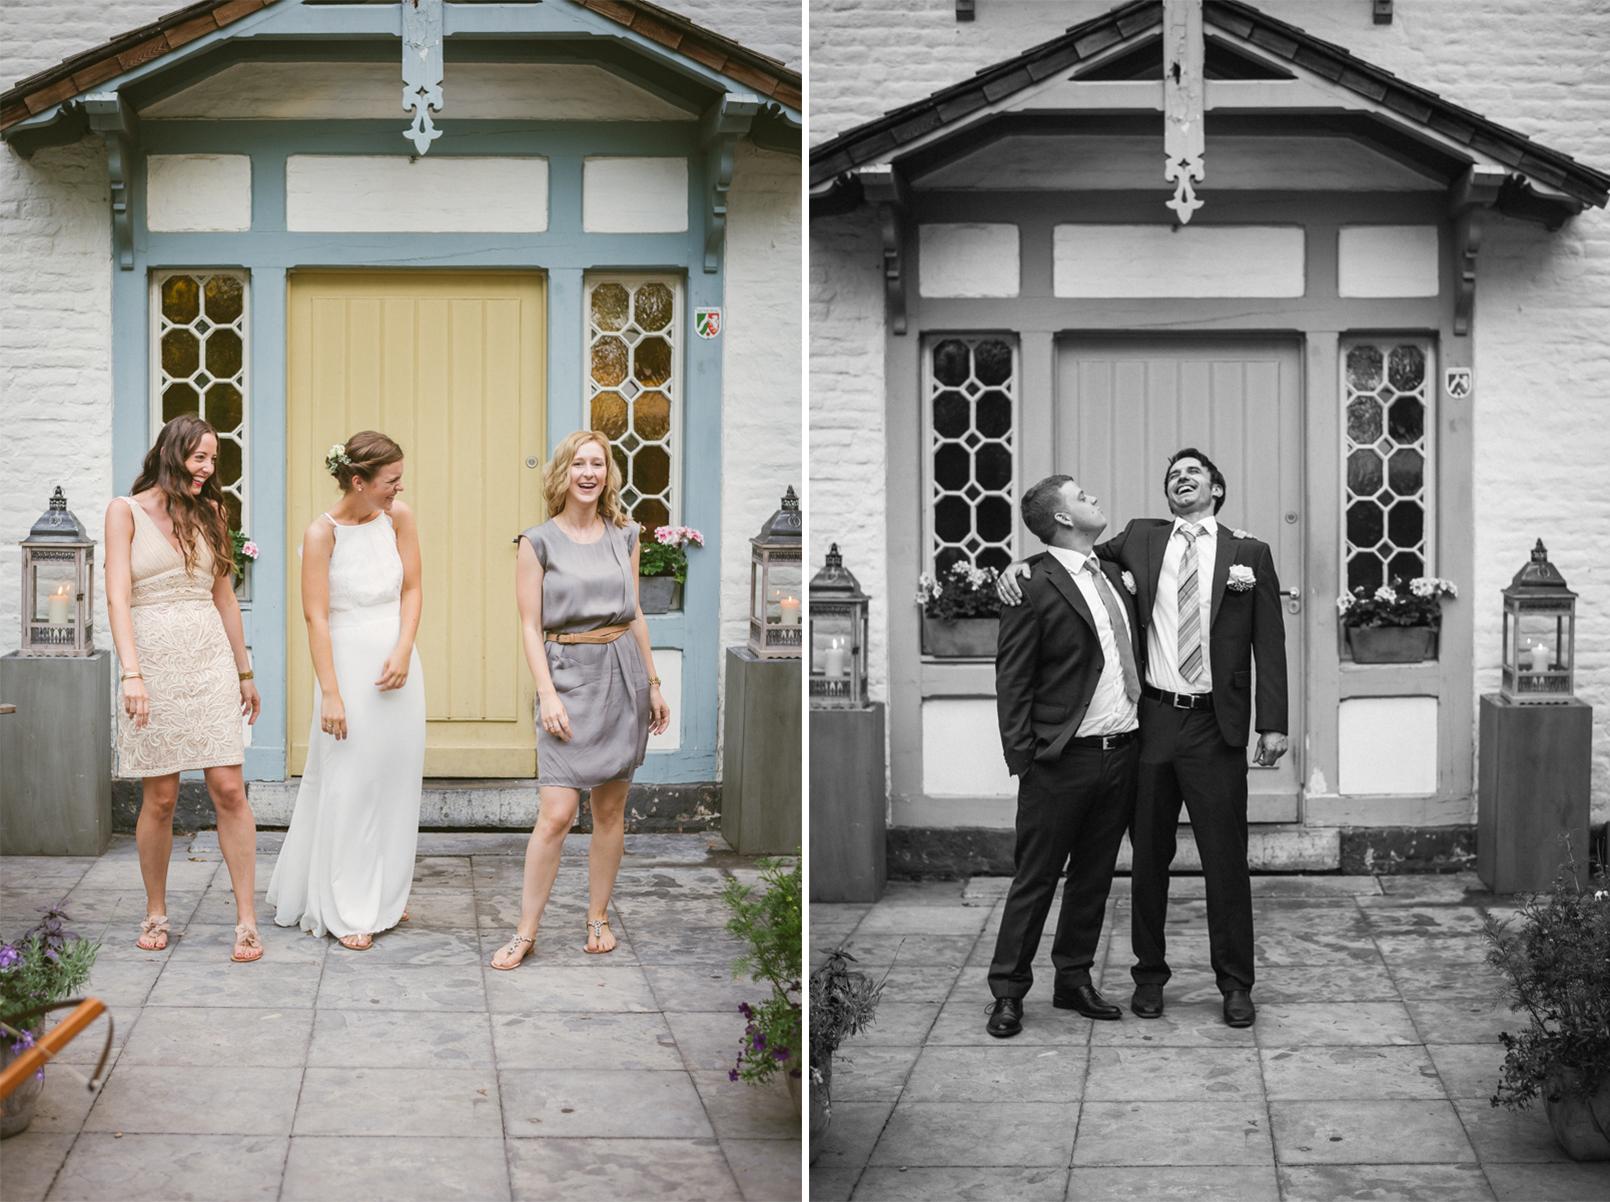 Hochzeitsfotograf-Fotografie-Aachen-Lua-Pauline-Dreamcatcher-0077